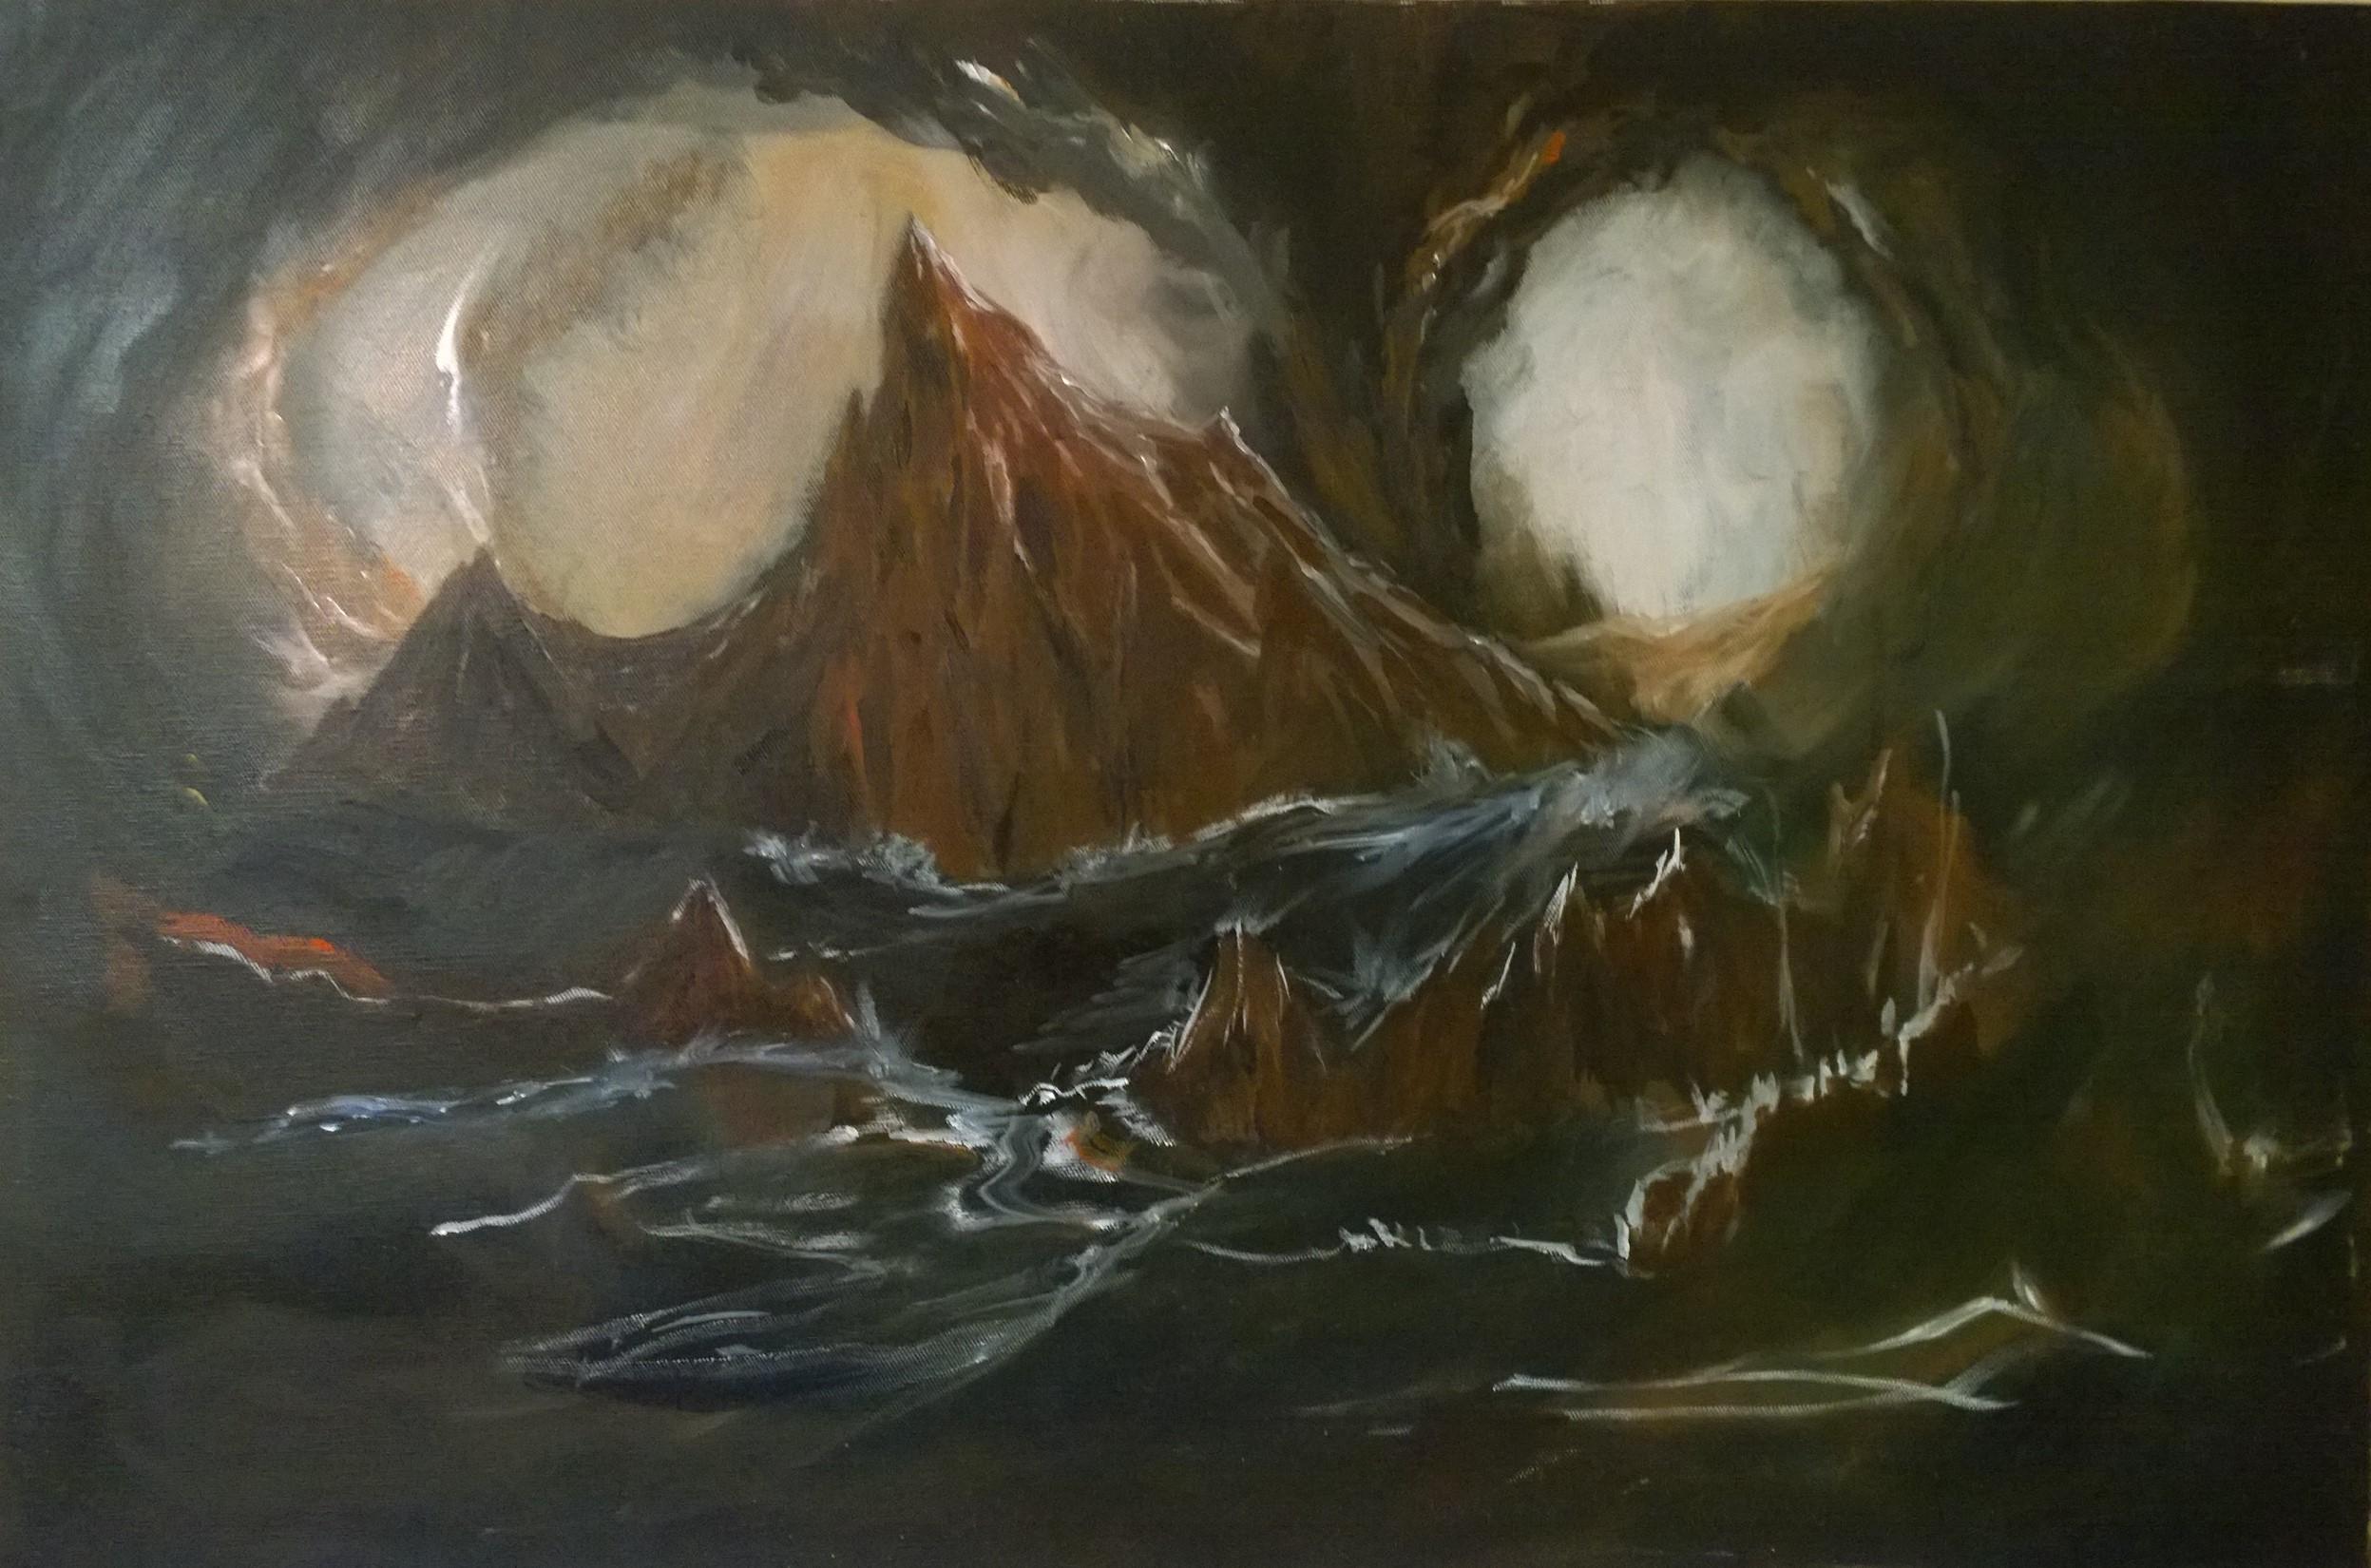 60x84 cm  Oil on Canvas